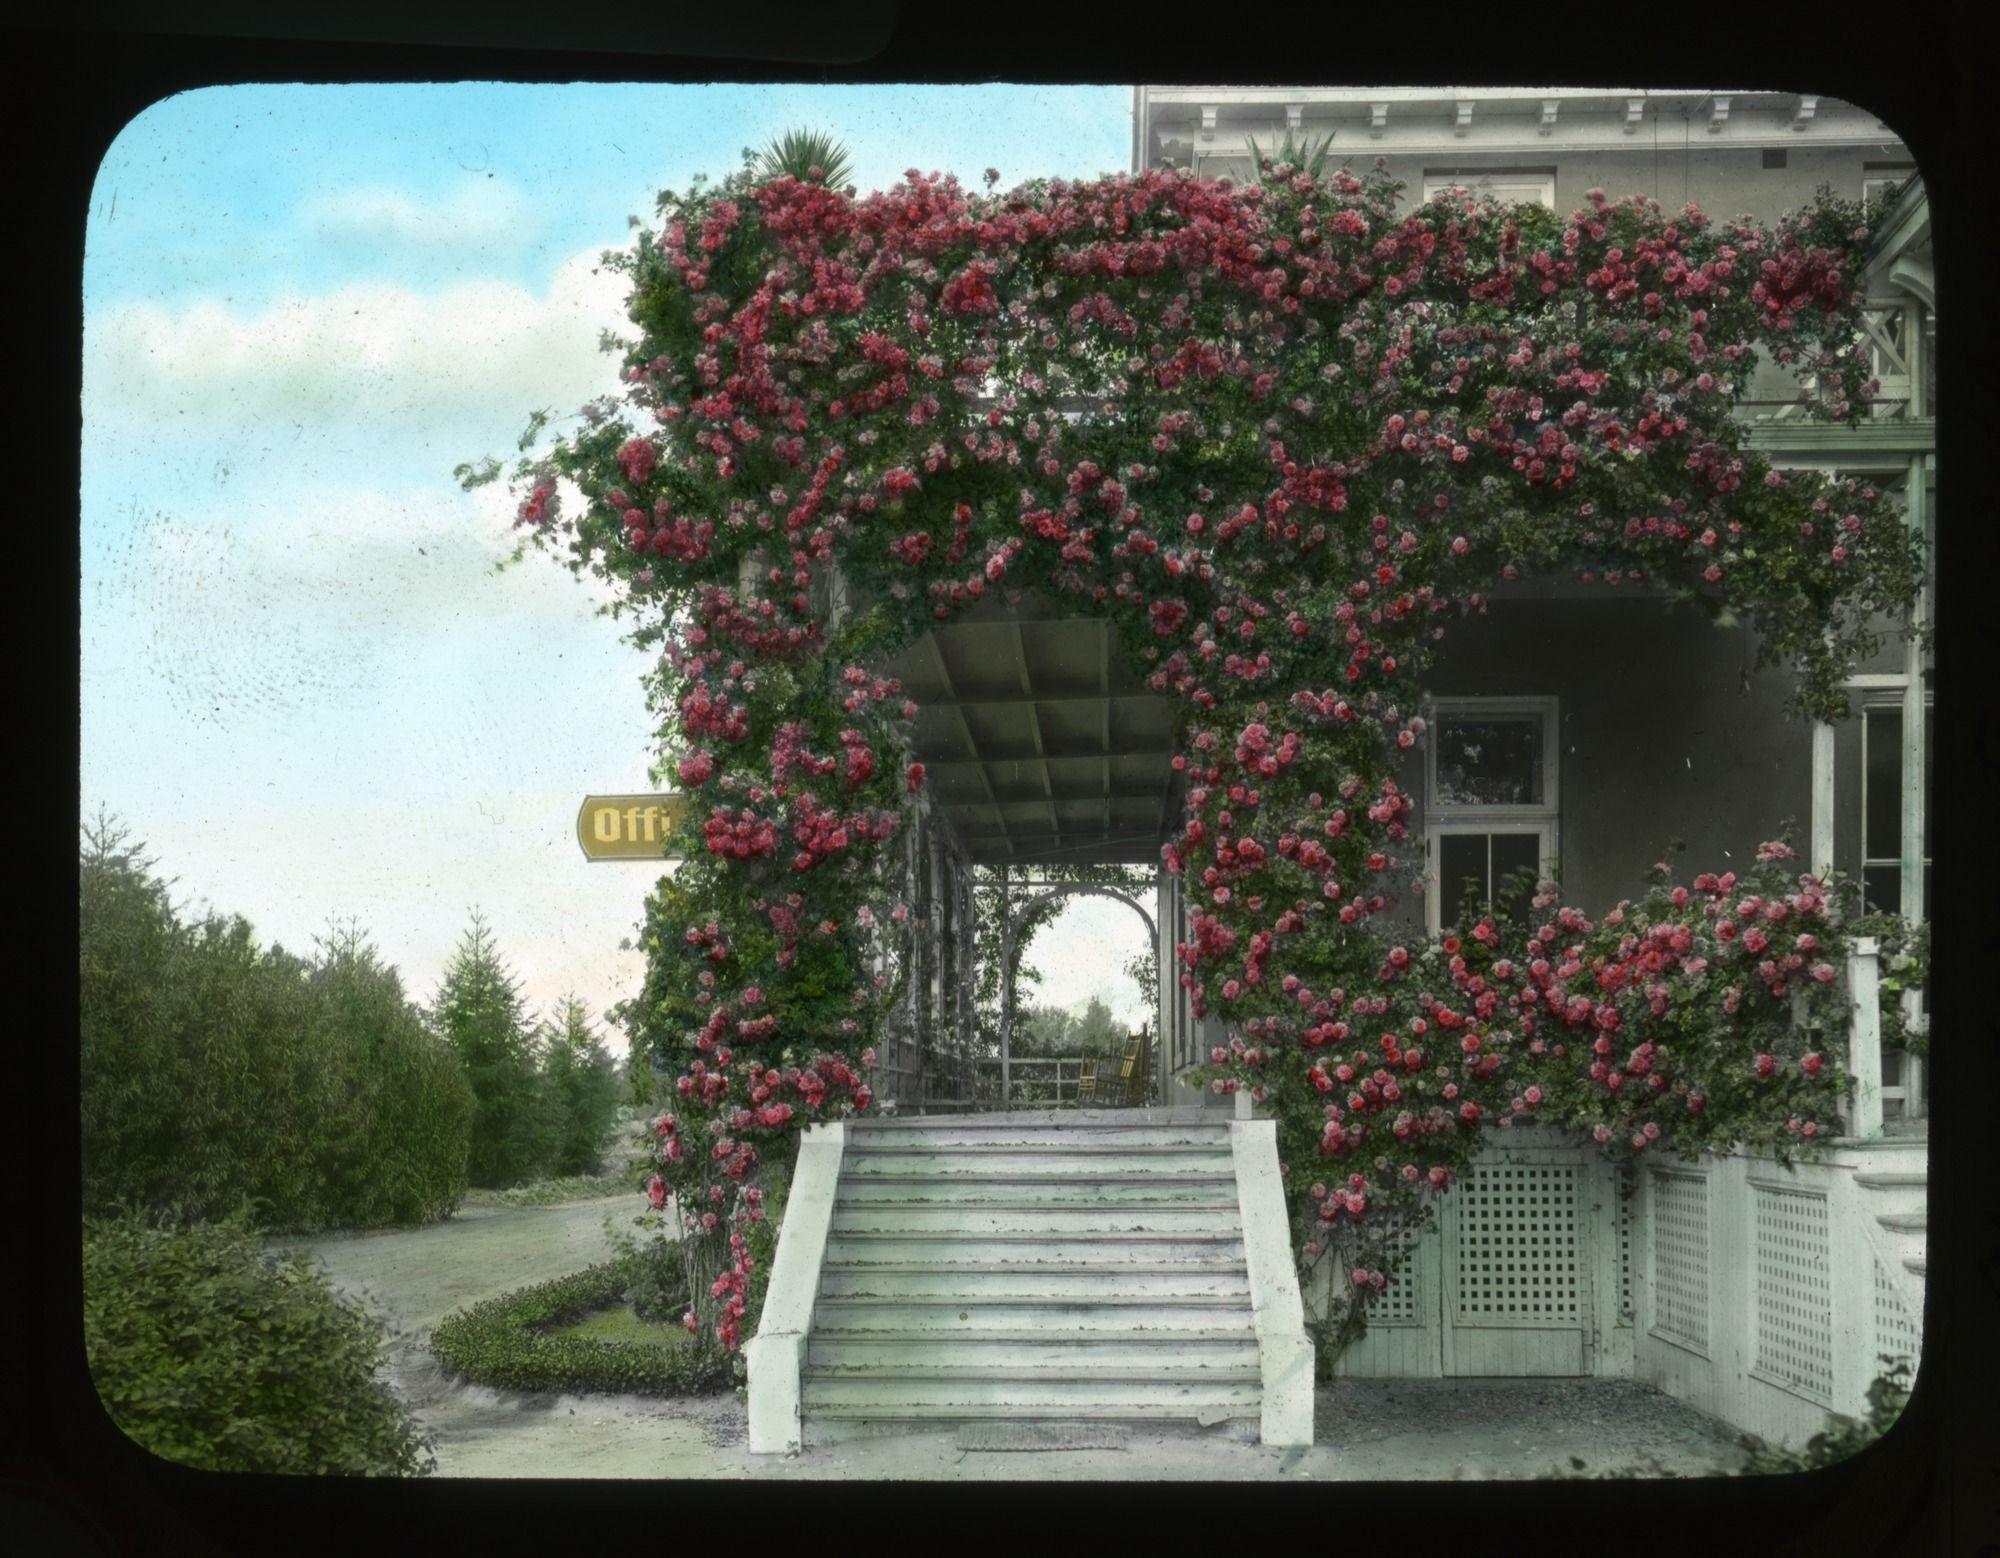 The Rose Reine Alga De Wurtenburg Covers A Porch At Kearny